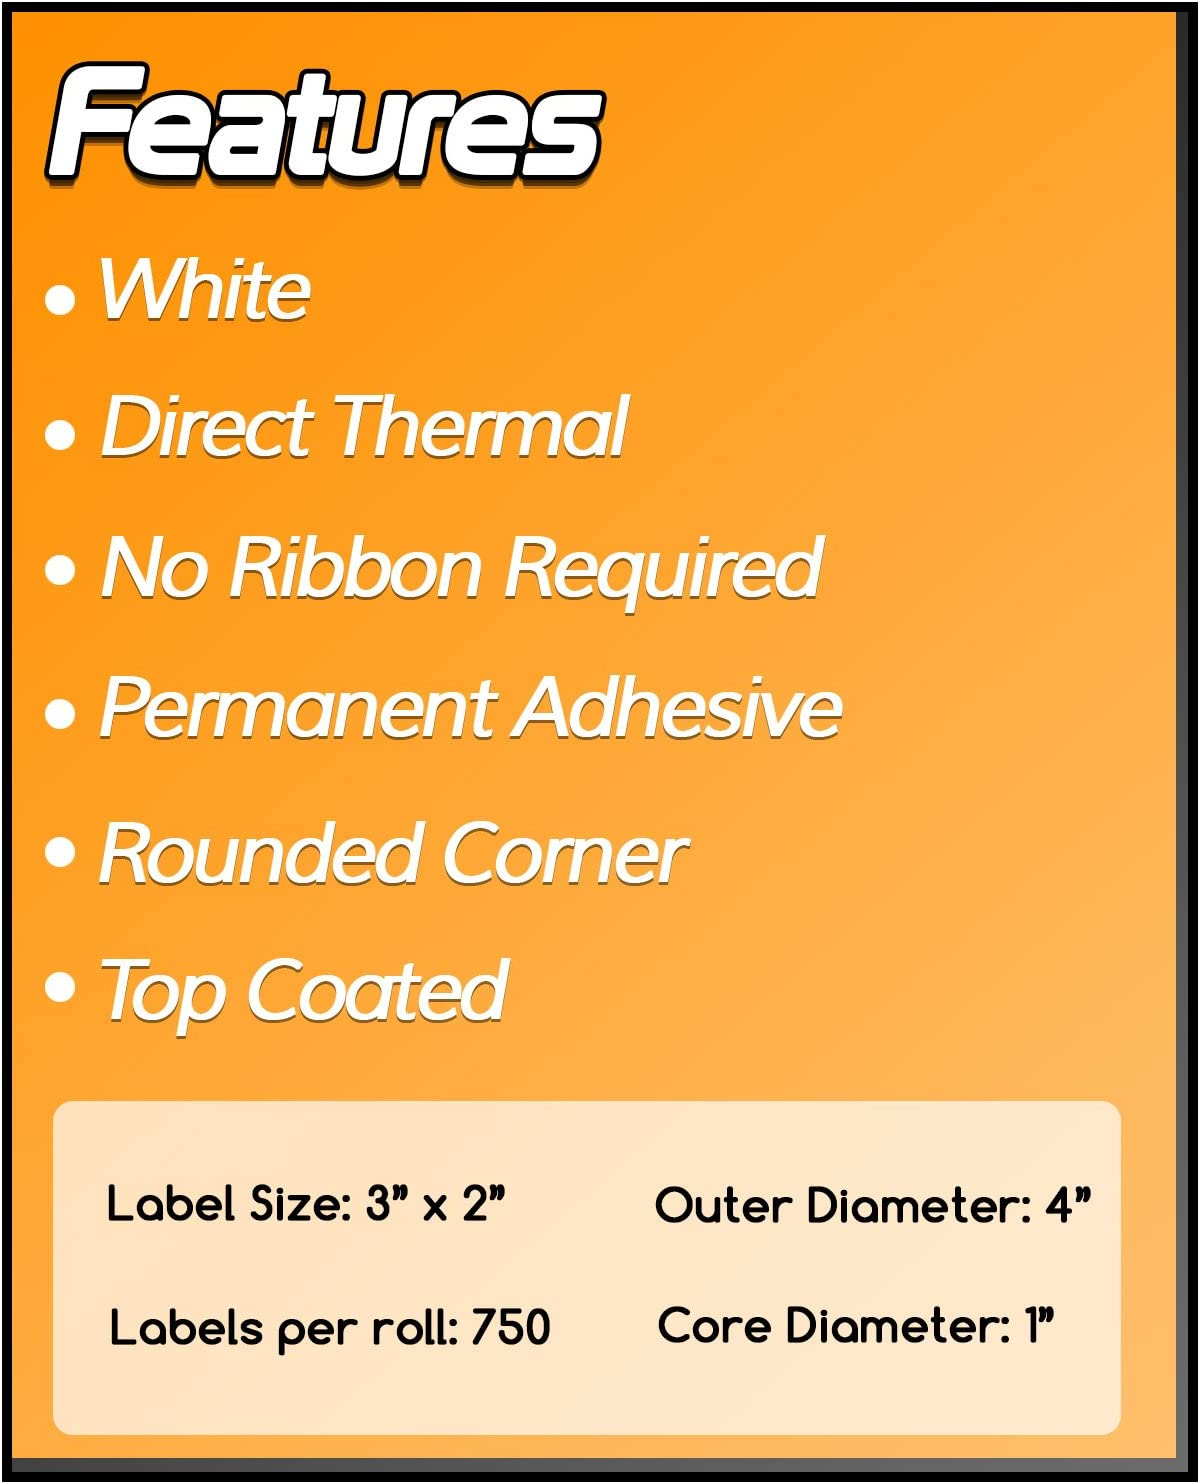 1 Inch Core 2 x 1 Zebra Compatible Direct Thermal Labels 4 Packs for Zebra Desktop Printer GC420d GC420t GK420d GK420t GX420d GX420t GX430t LP2824 LP2824Plus LP2422 TLP2824 TLP2824Plus LP2844 LP2442 TLP2844 ZP450 ZD500 ZD500R ZP500 ZP505